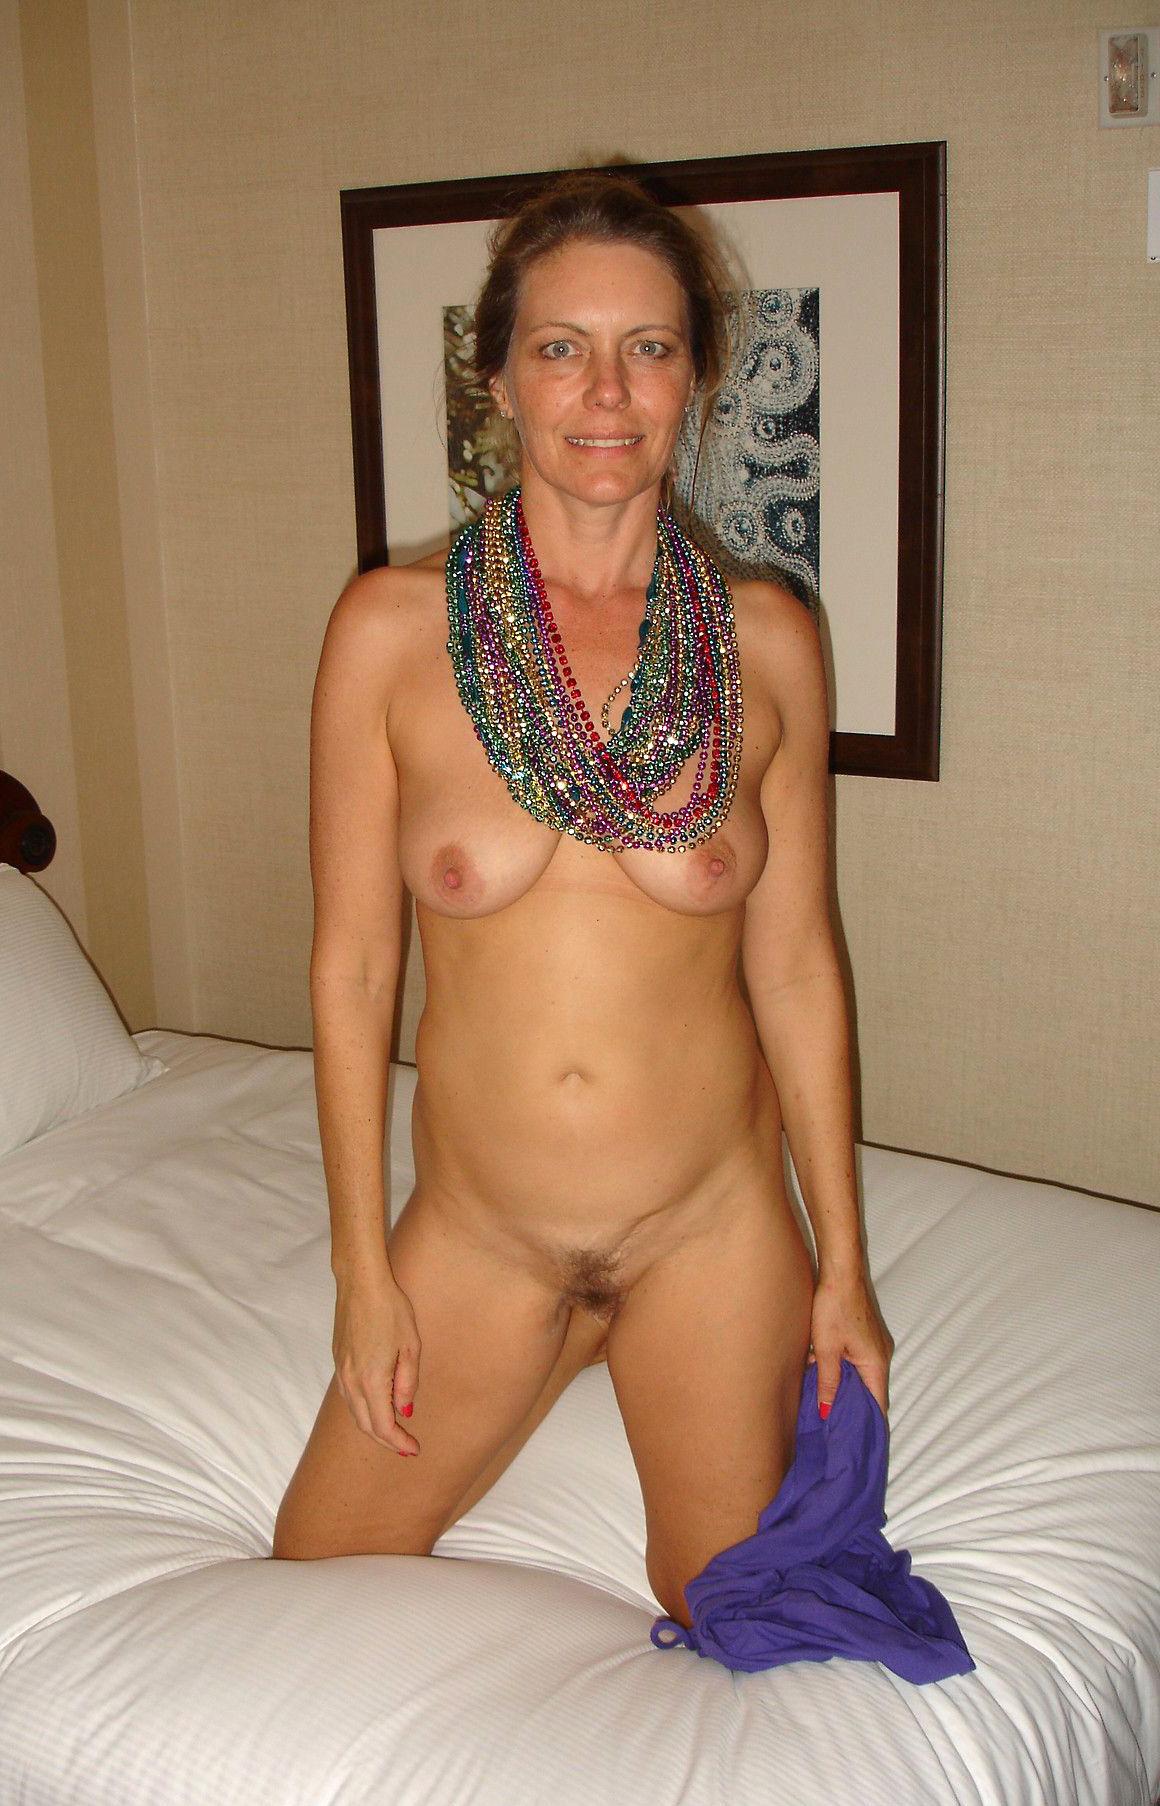 Big breast girl video